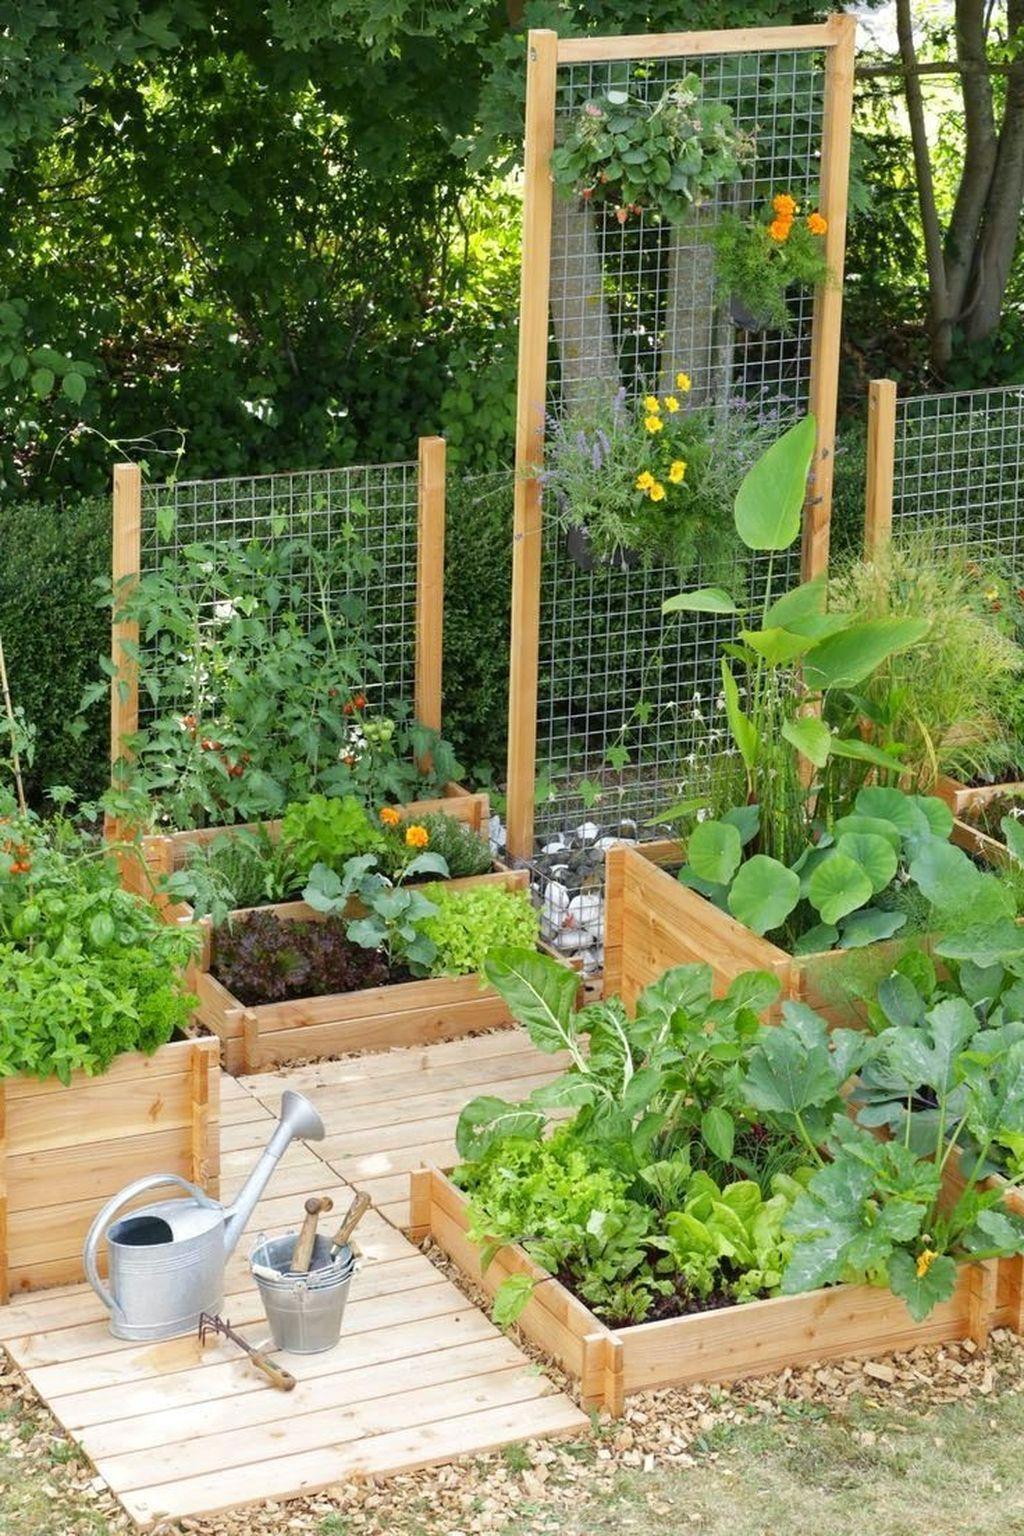 Photo of 20+ Minimalist Garden Design Ideas For Small Garden – TRENDUHOME